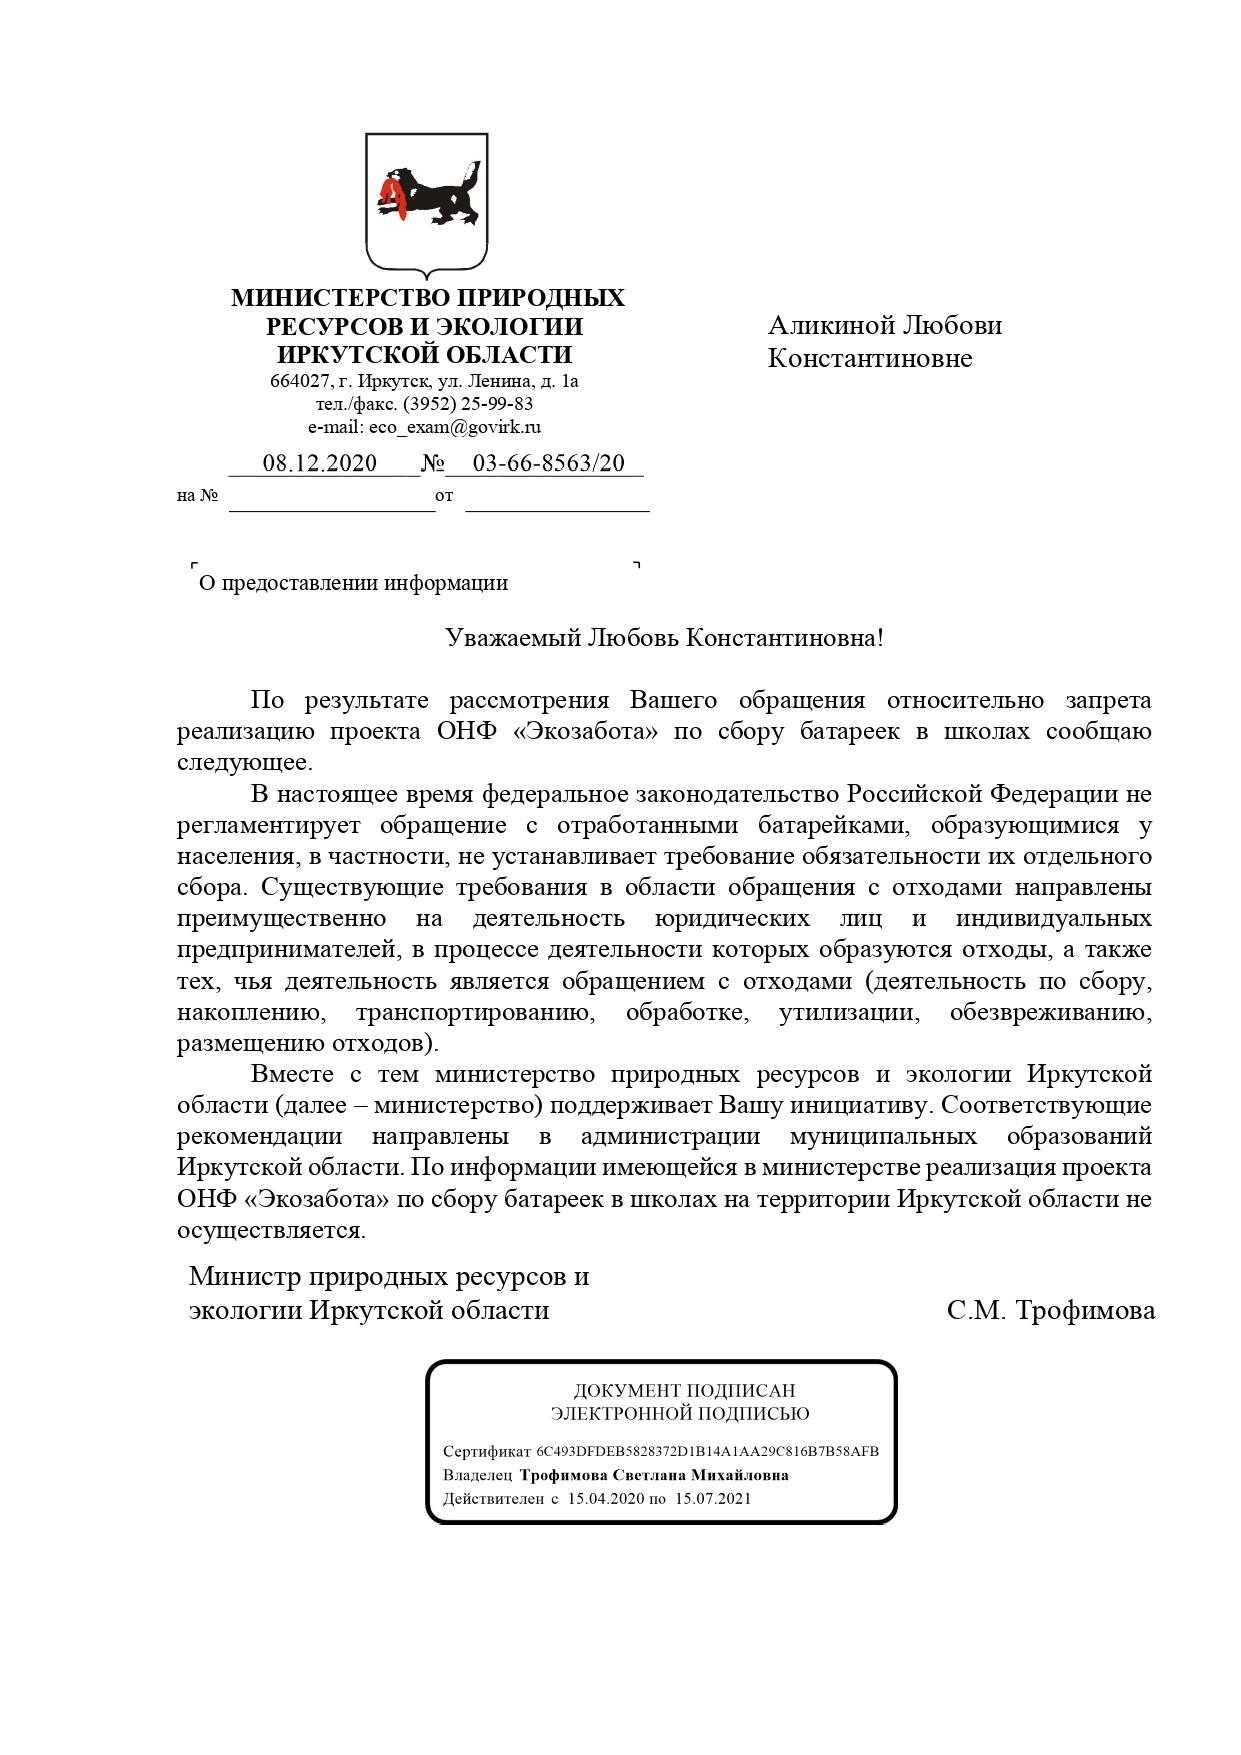 Правительство Иркутской области фактически запретило проведение проекта «Экозабота» ОНФ на территории области - фото 2